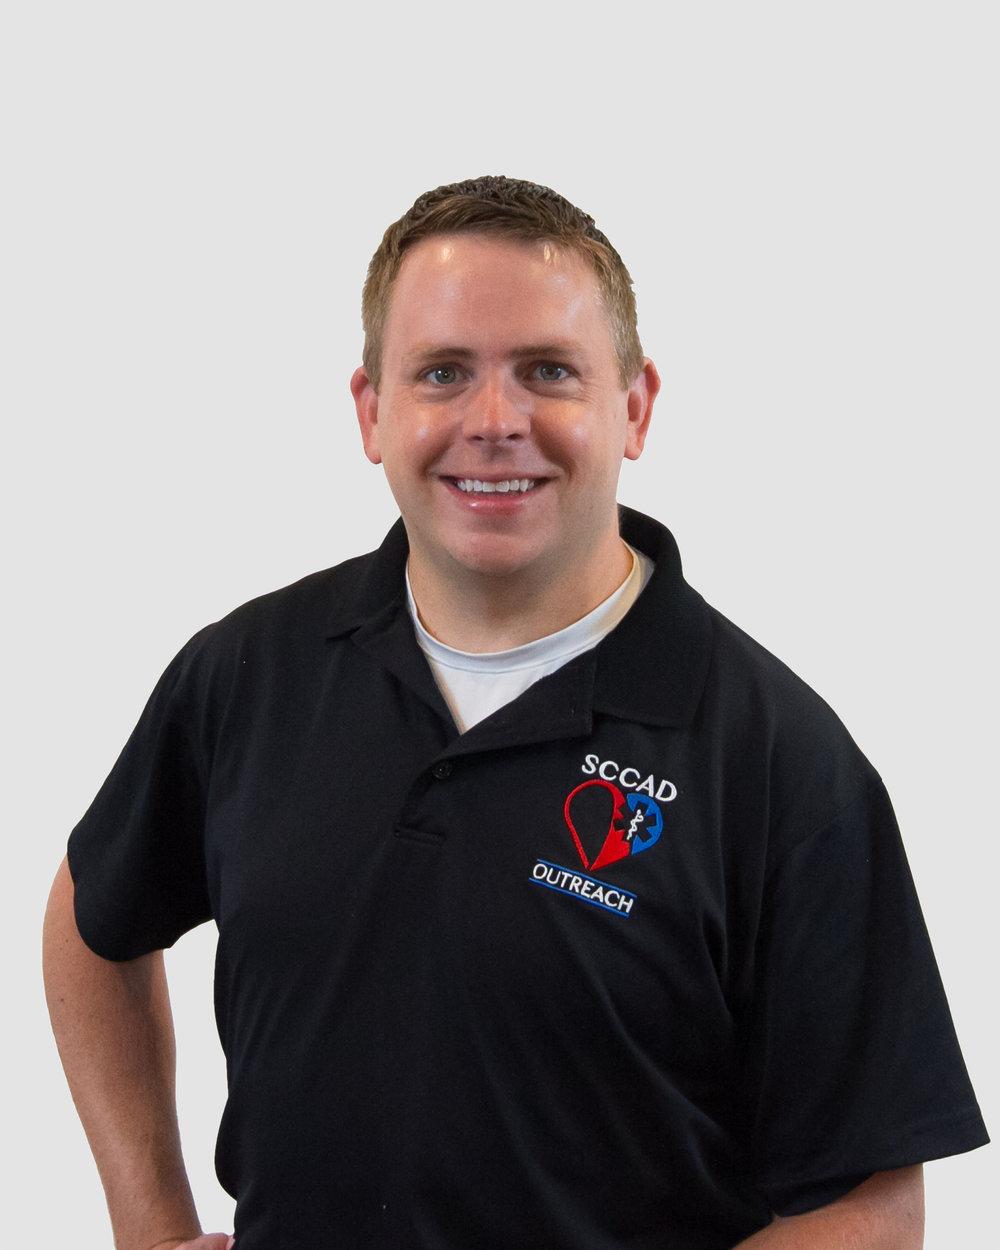 Dan Licavoli - Vice President, Business Development